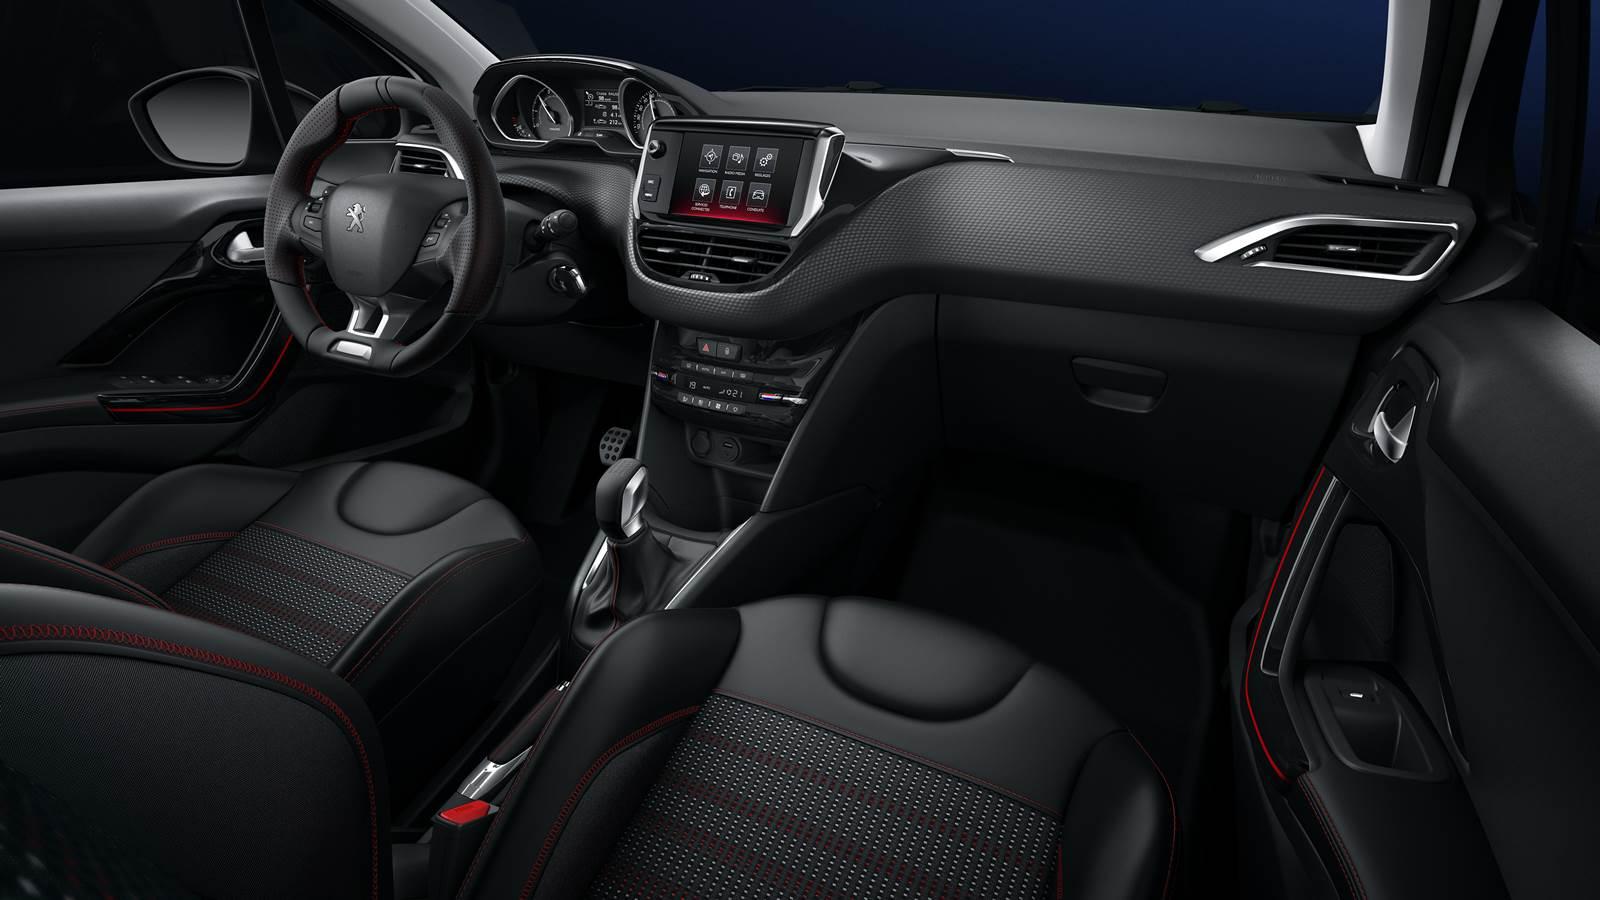 Novo Peugeot 208 2016 GT Line - interior